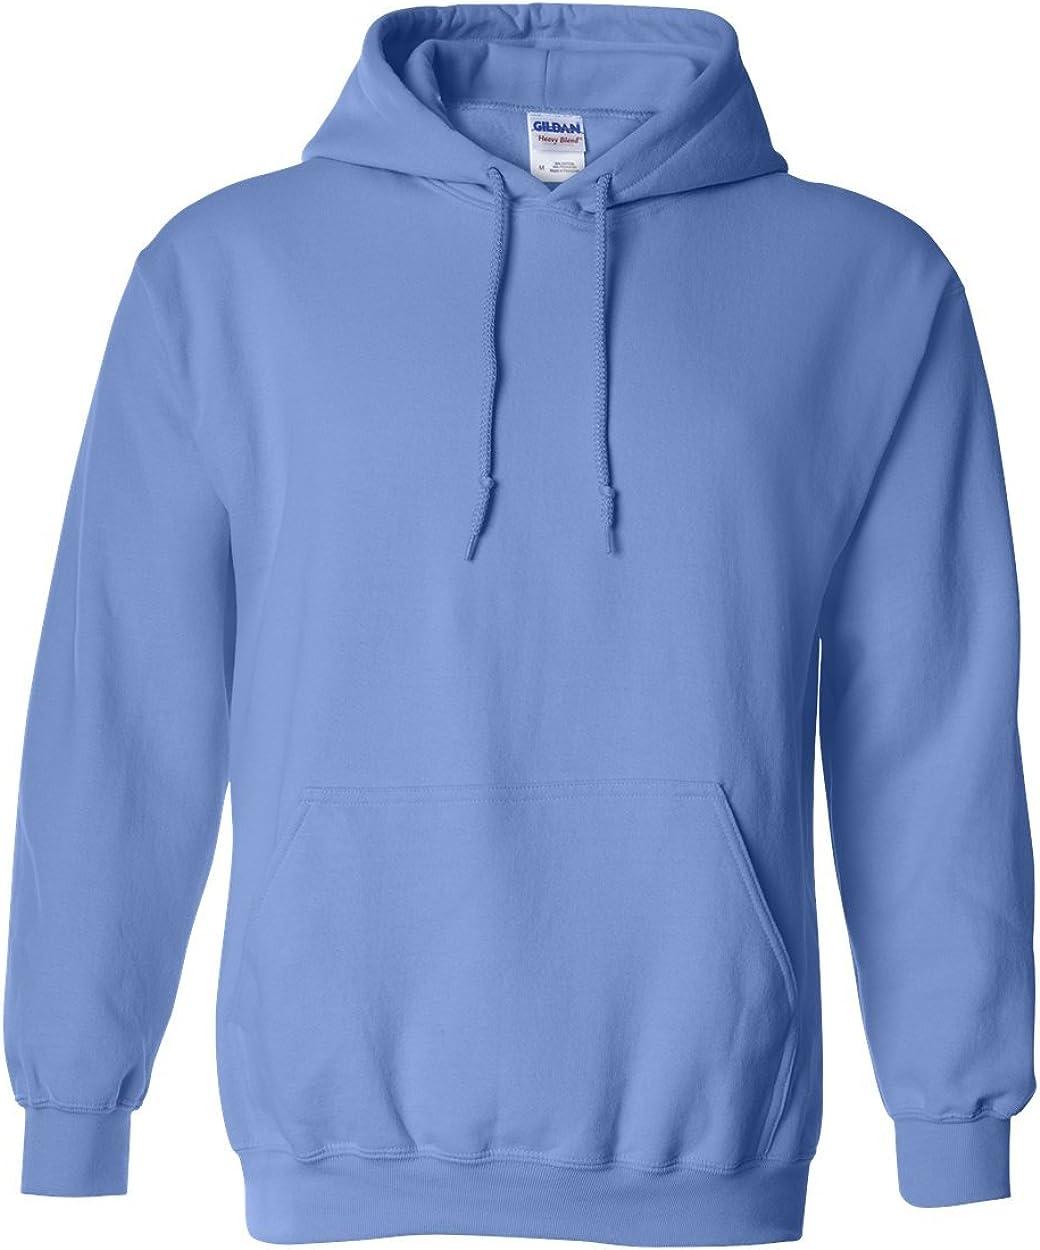 GILDAN Mens Rib Knit Pouch Pocket Hooded Sweatshirt